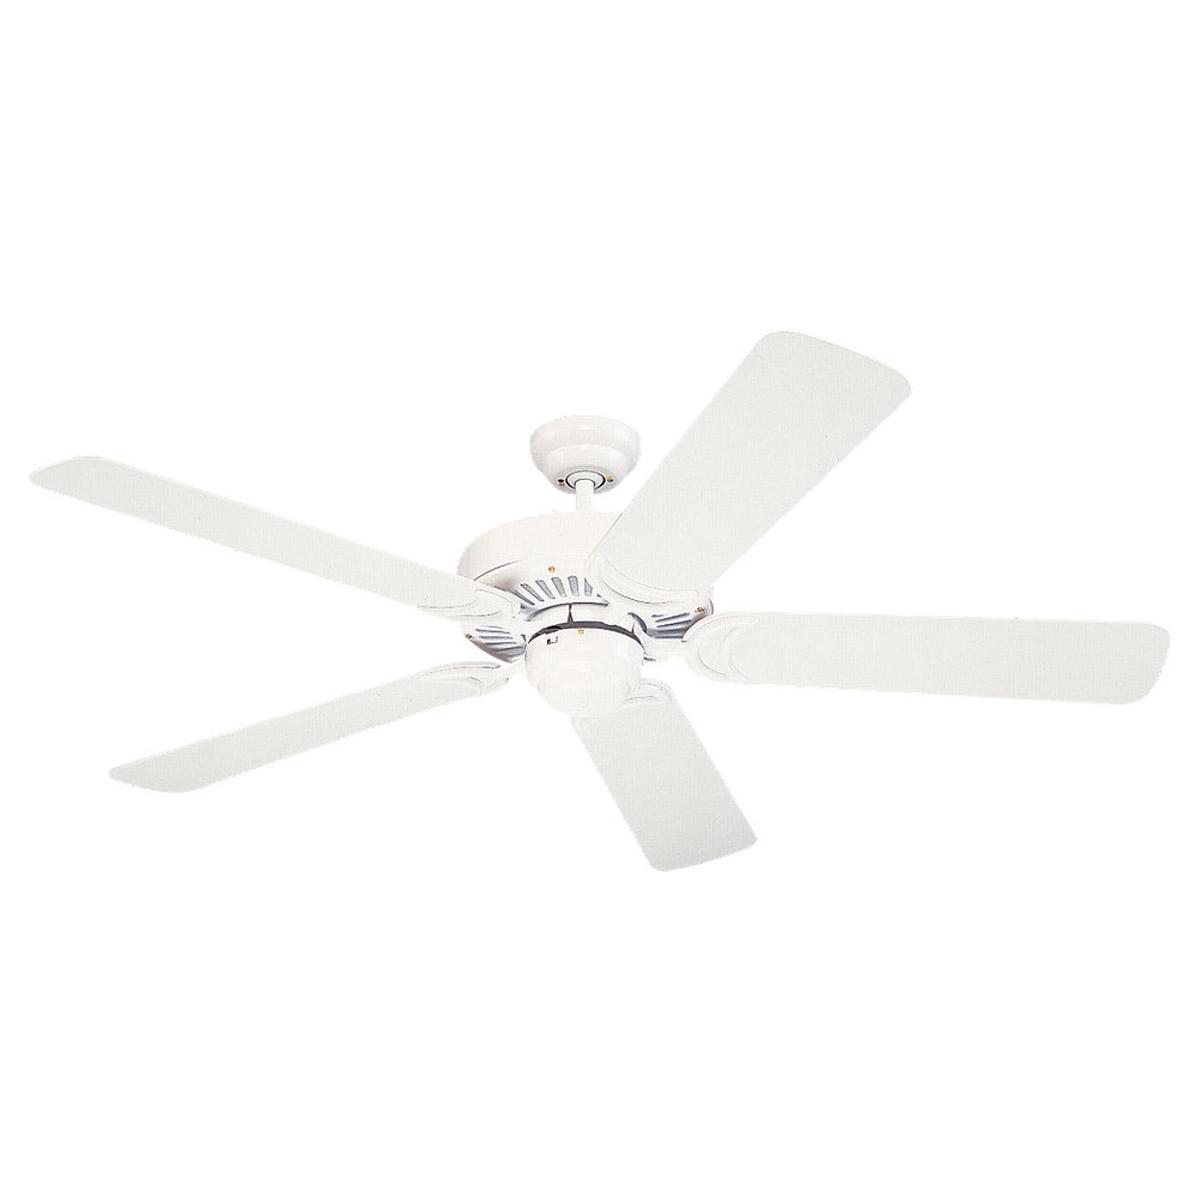 Sea gull lighting 52in celebrity deluxe ceiling fan in white 1535 15 aloadofball Images